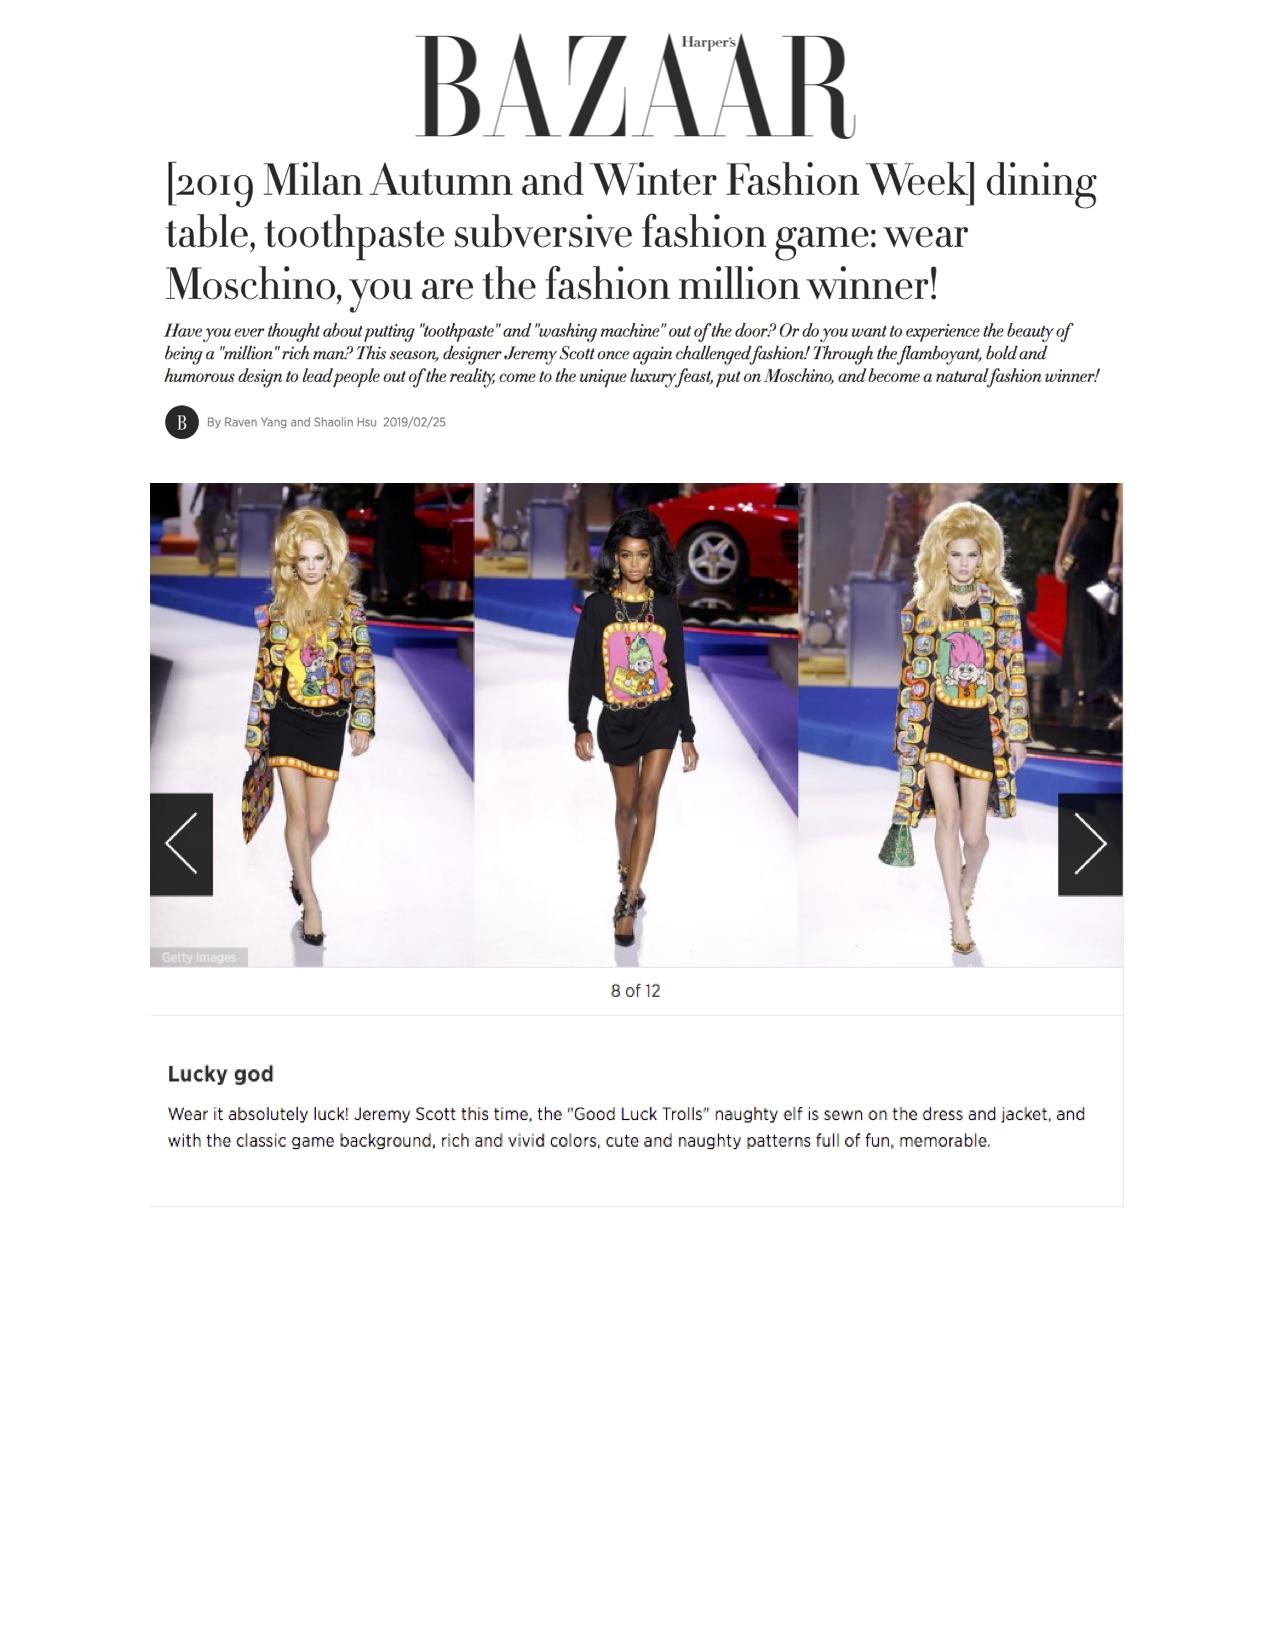 Harper's Bazaar Taiwan - Good Luck Trolls x Moschino.jpg